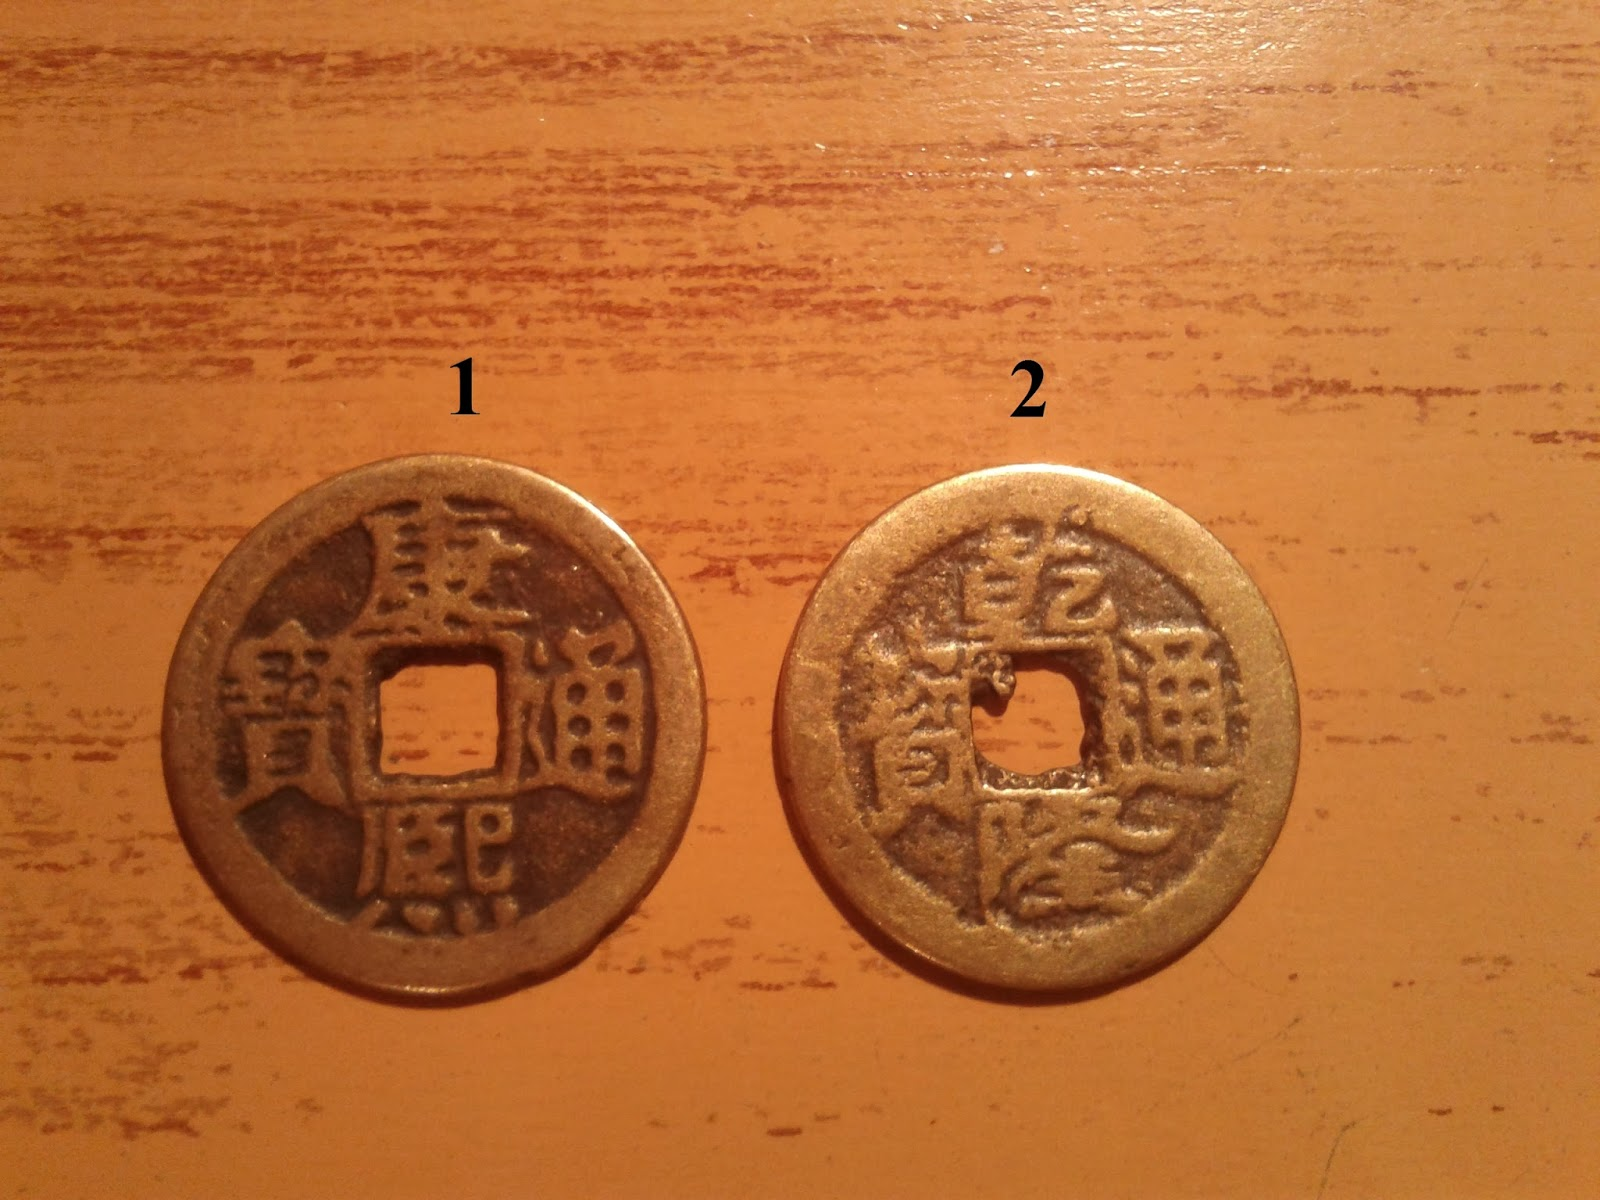 SEYCHELLES SET OF 5 COINS 1 5 10 25 CENTS 1 RUPEES 2004-2010 UNC